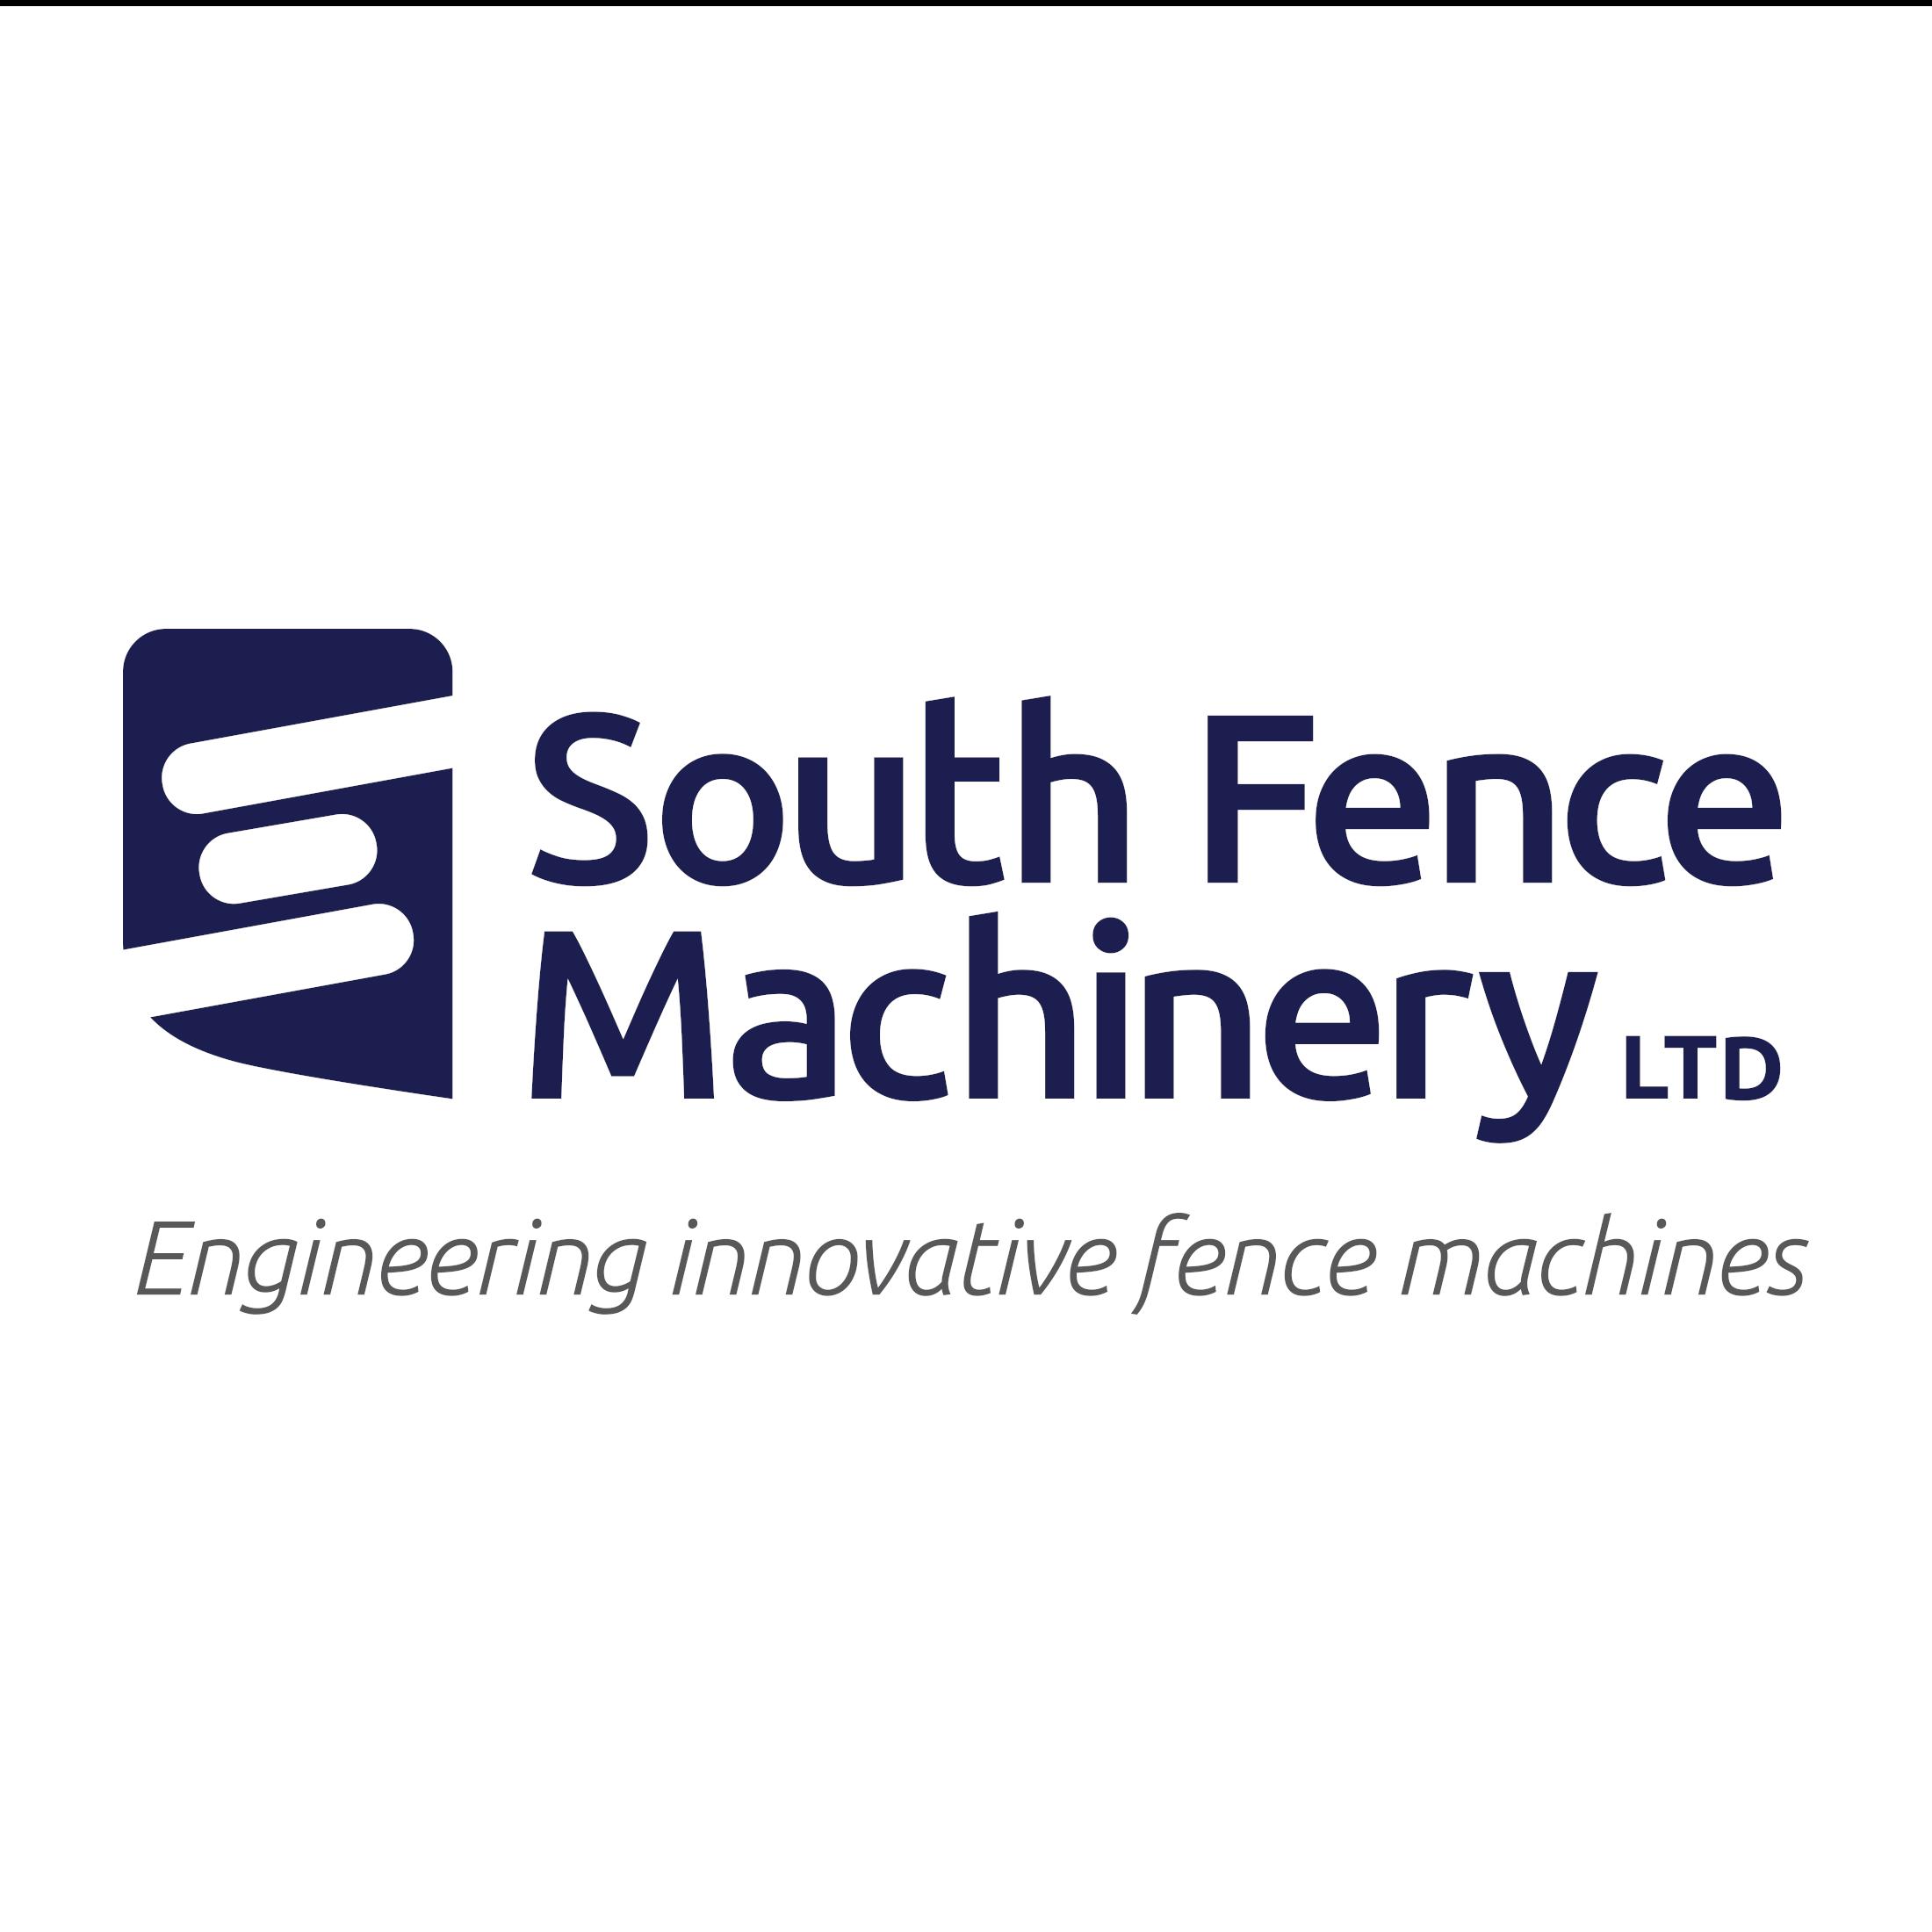 South Fence Machinery Ltd